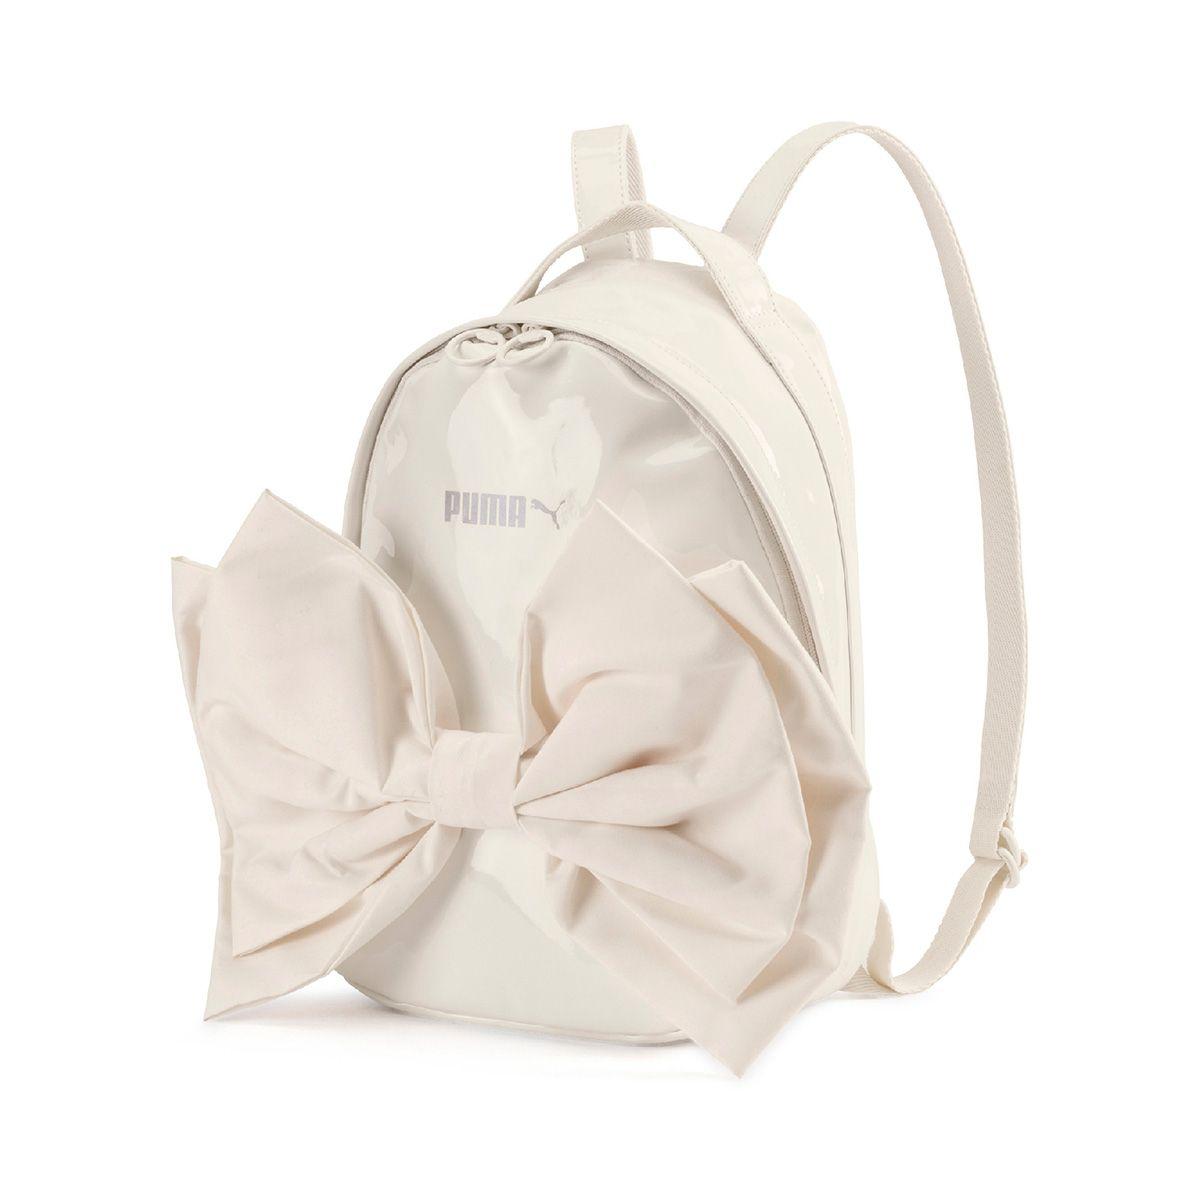 Mochila Puma Prime Archive Backpack Bow - Compre Agora  55534b73e6b90